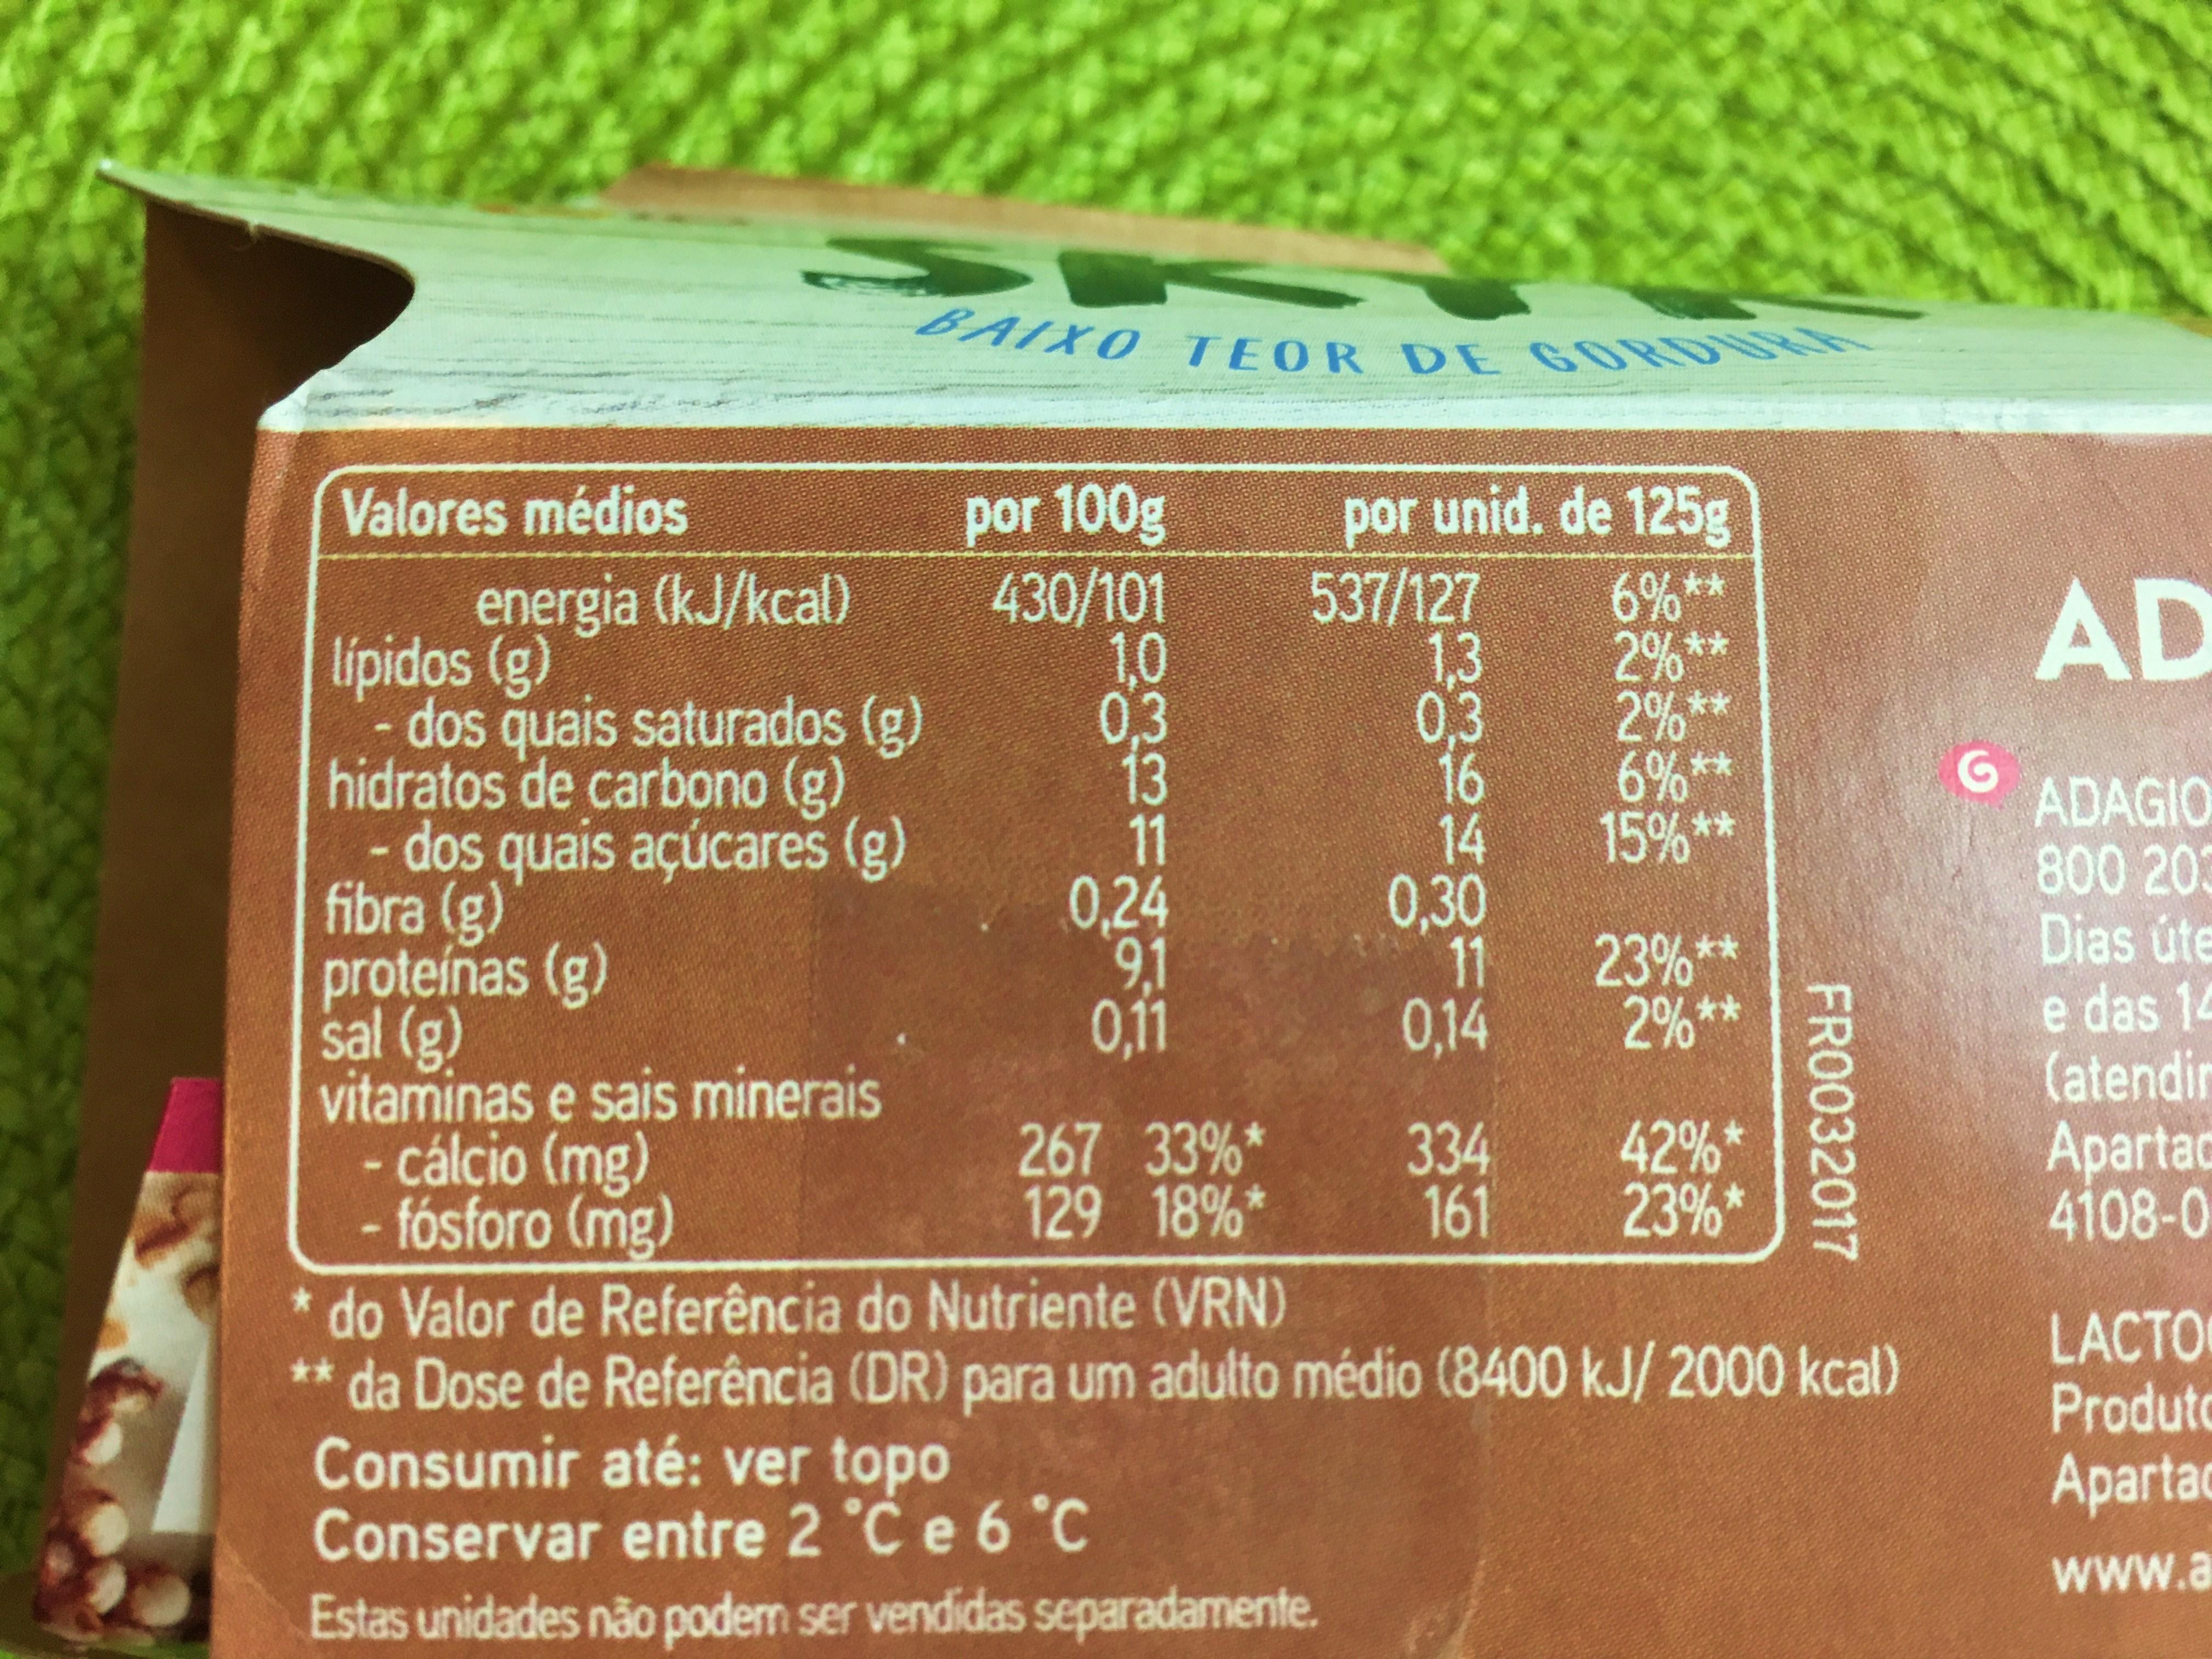 Iogurte Adagio Skyr Valor Nutricional